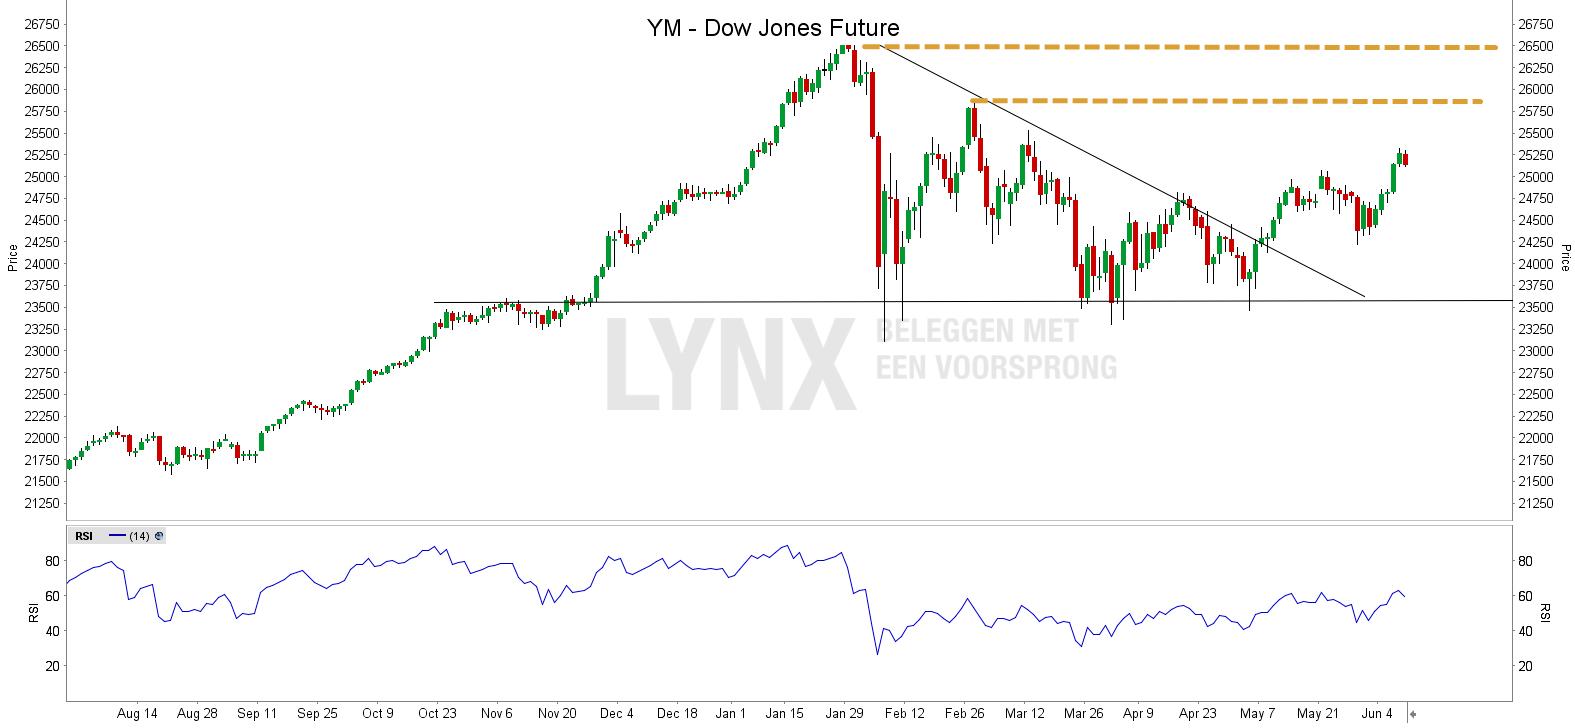 YM Dow Jones